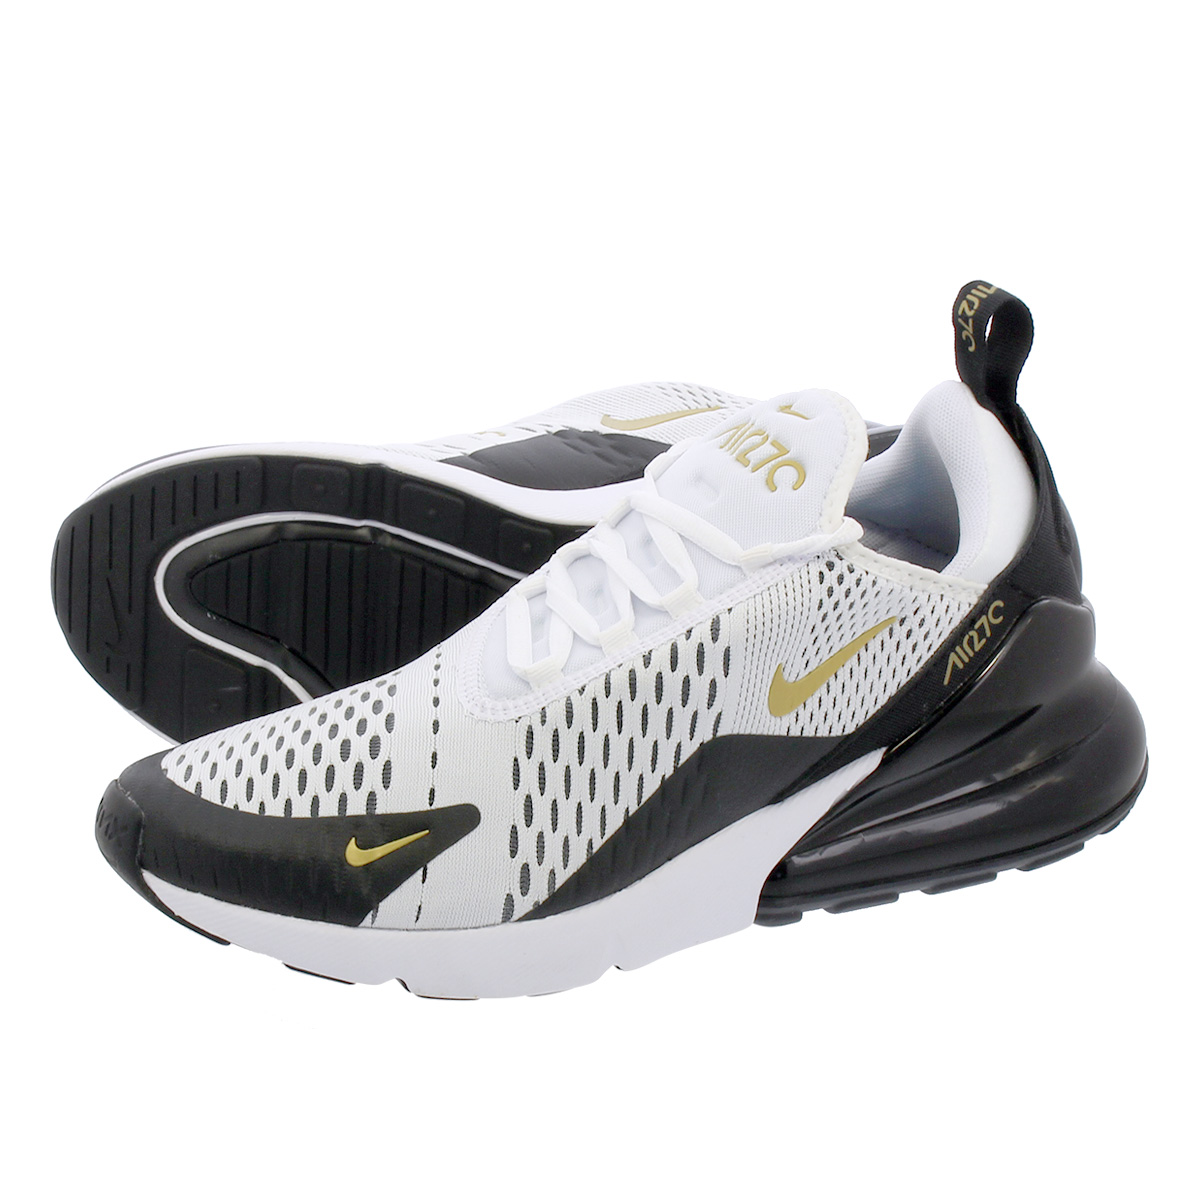 Men's Size Nike Air Max 270 Tiger BlackUniversity Gold Hot